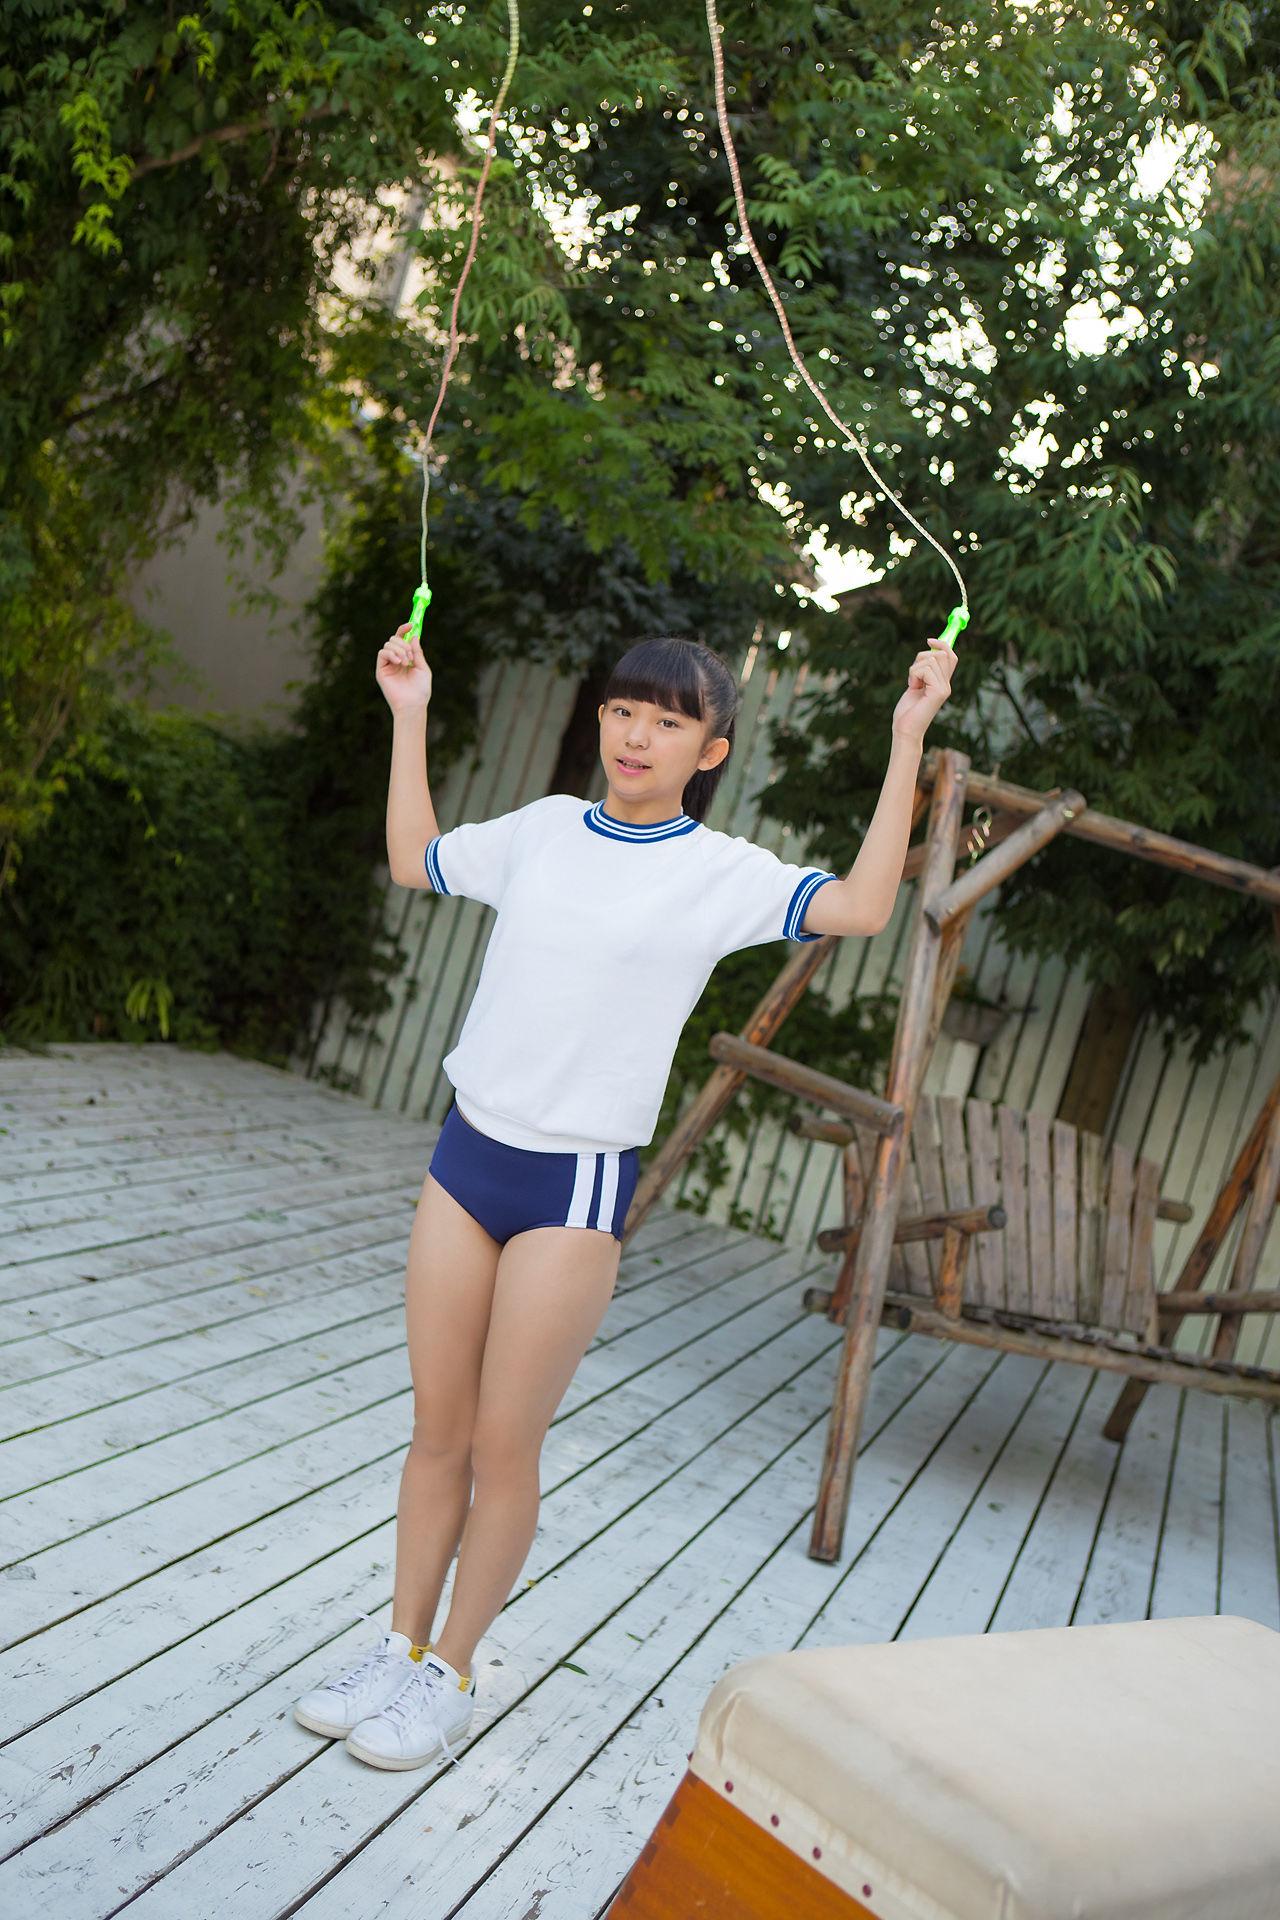 [Minisuka] 久川美佳 Mika Hisakawa - Limited Gallery 2.1[50P]